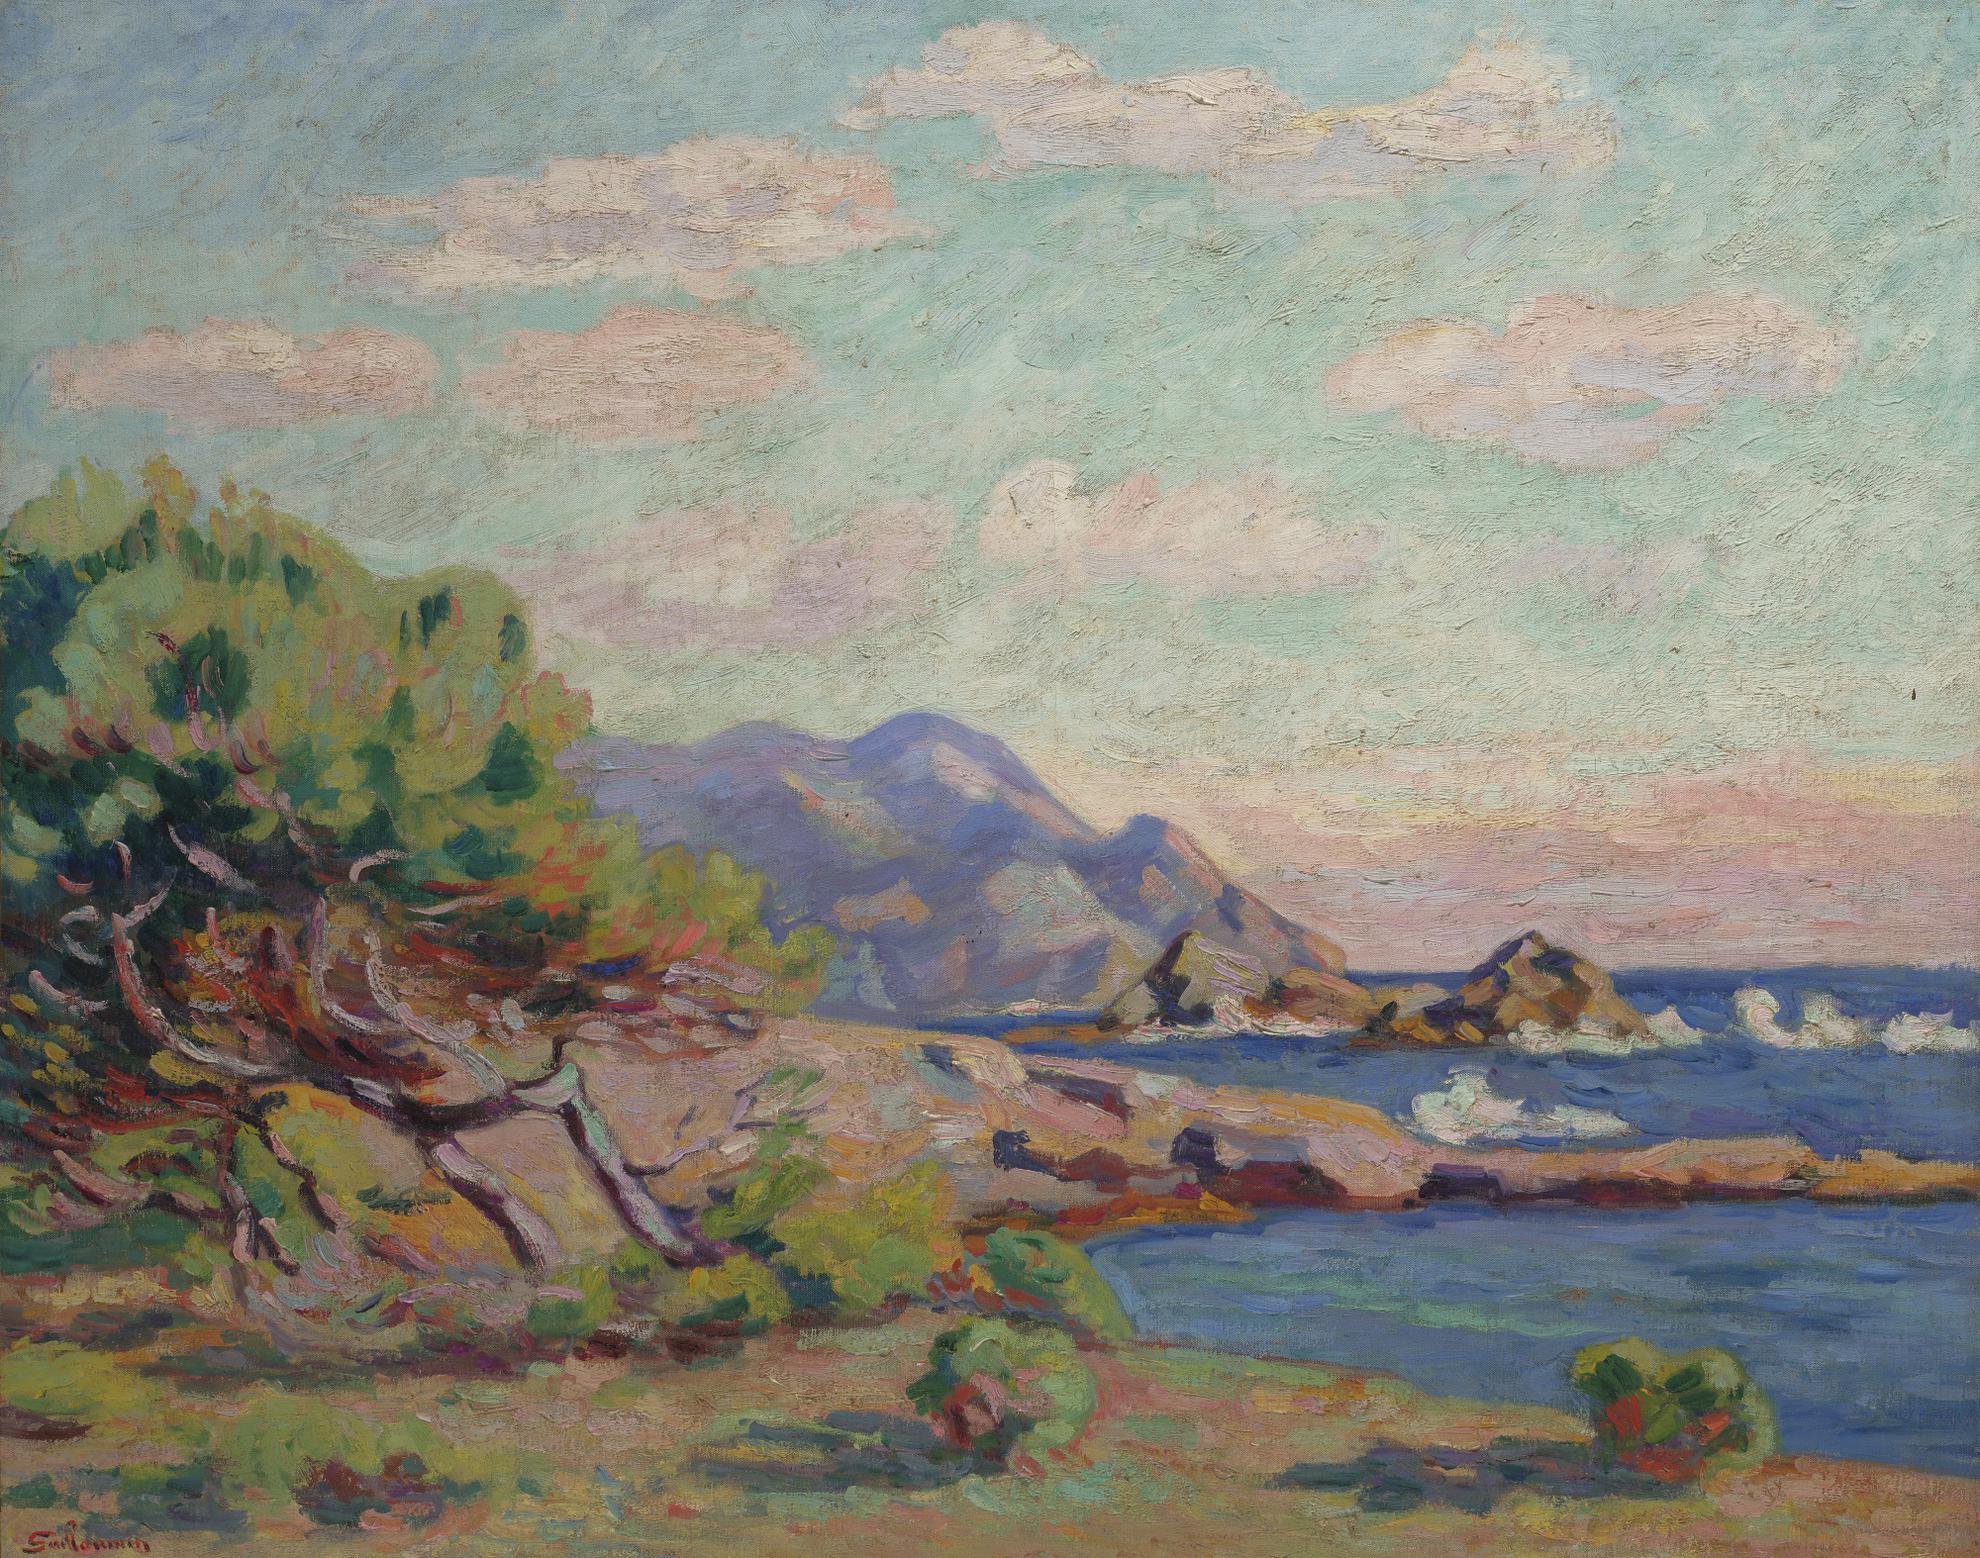 Jean-Baptiste Armand Guillaumin-La Pointe Du Lou Gaou-1911